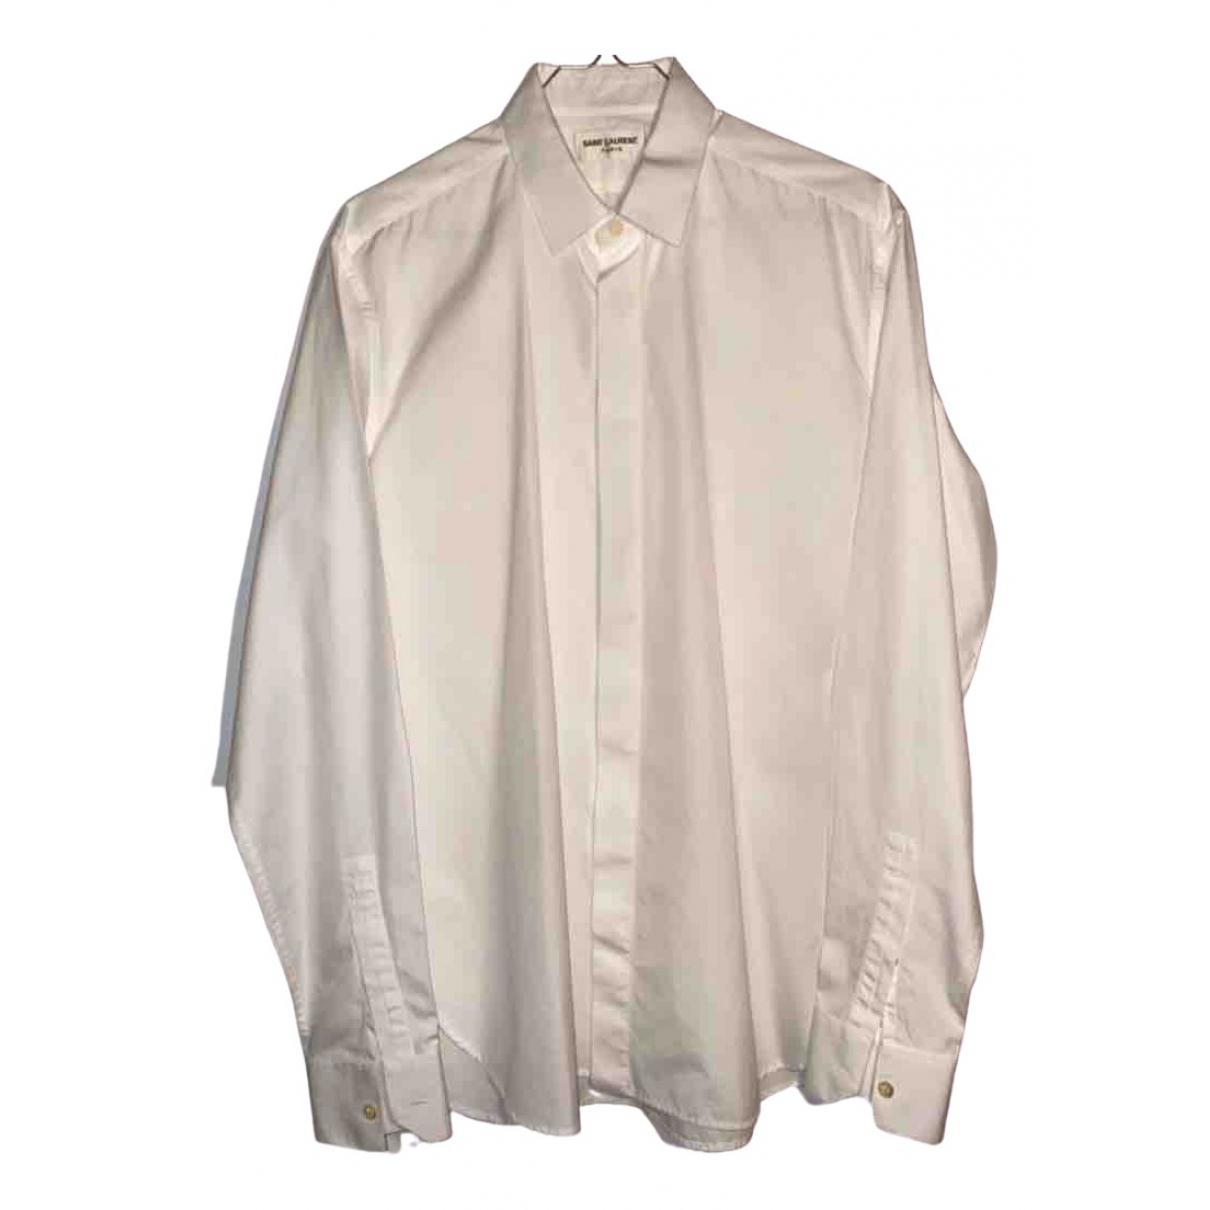 Saint Laurent \N White Cotton Shirts for Men S International